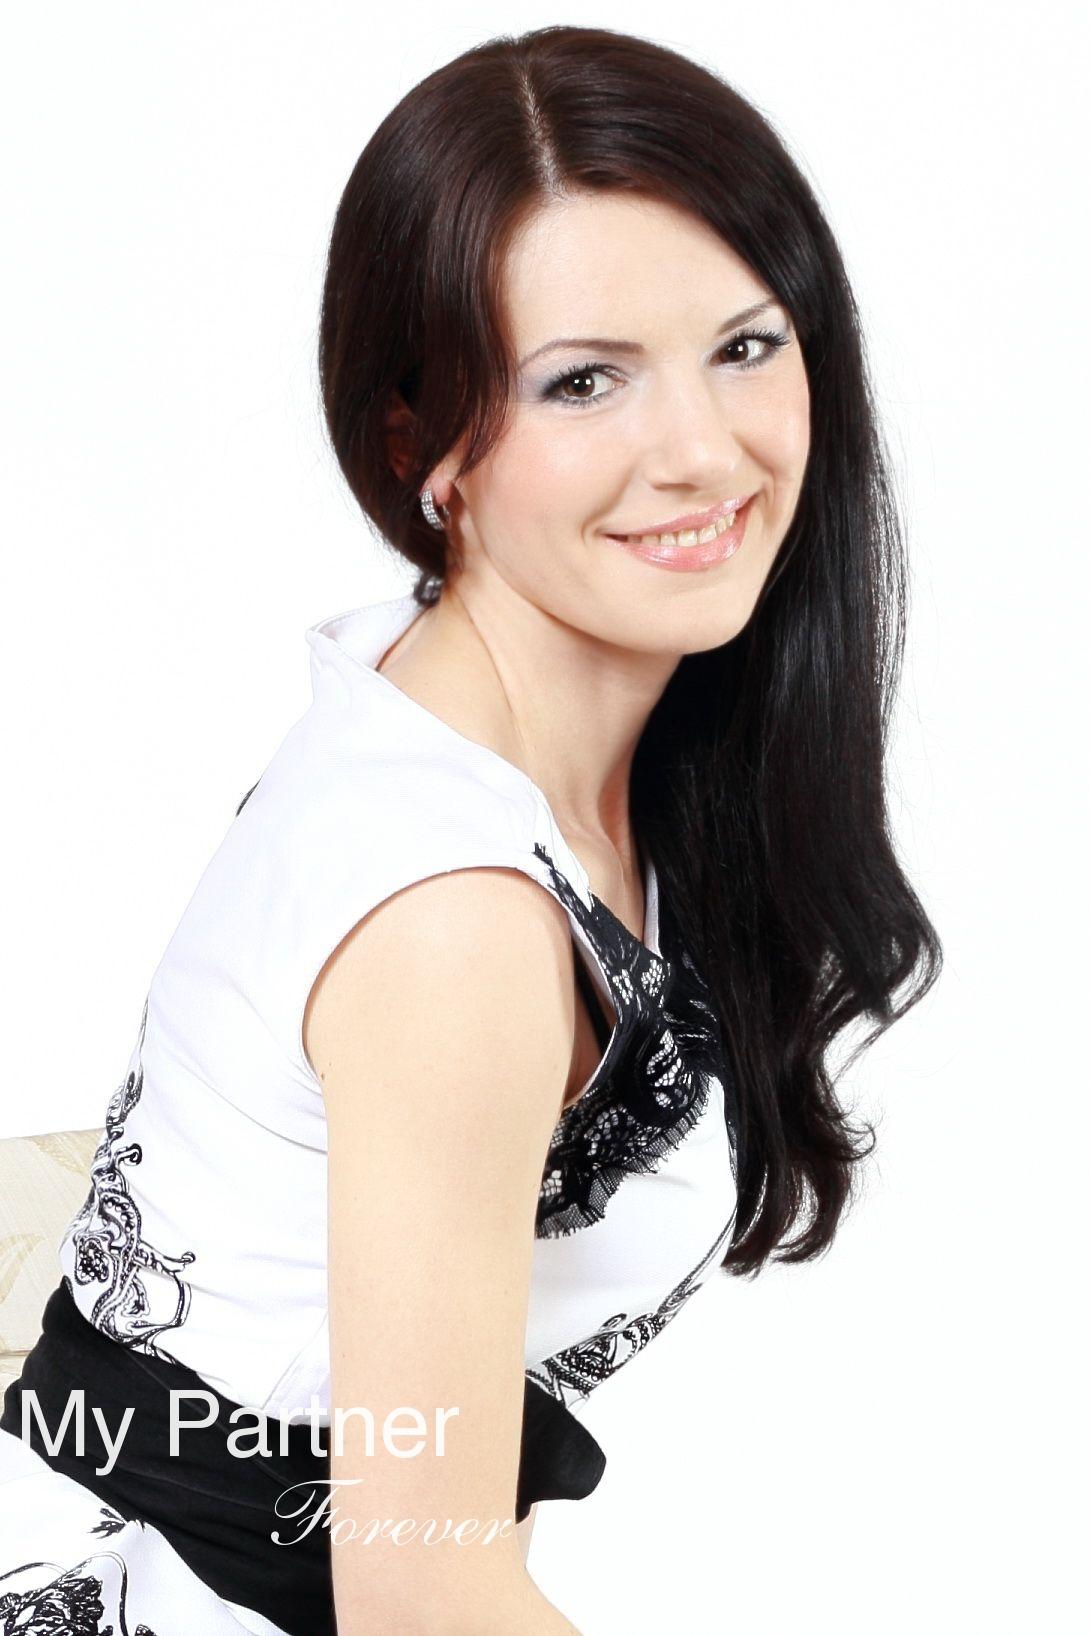 Marriage Agency to Meet Olga from Grodno, Belarus